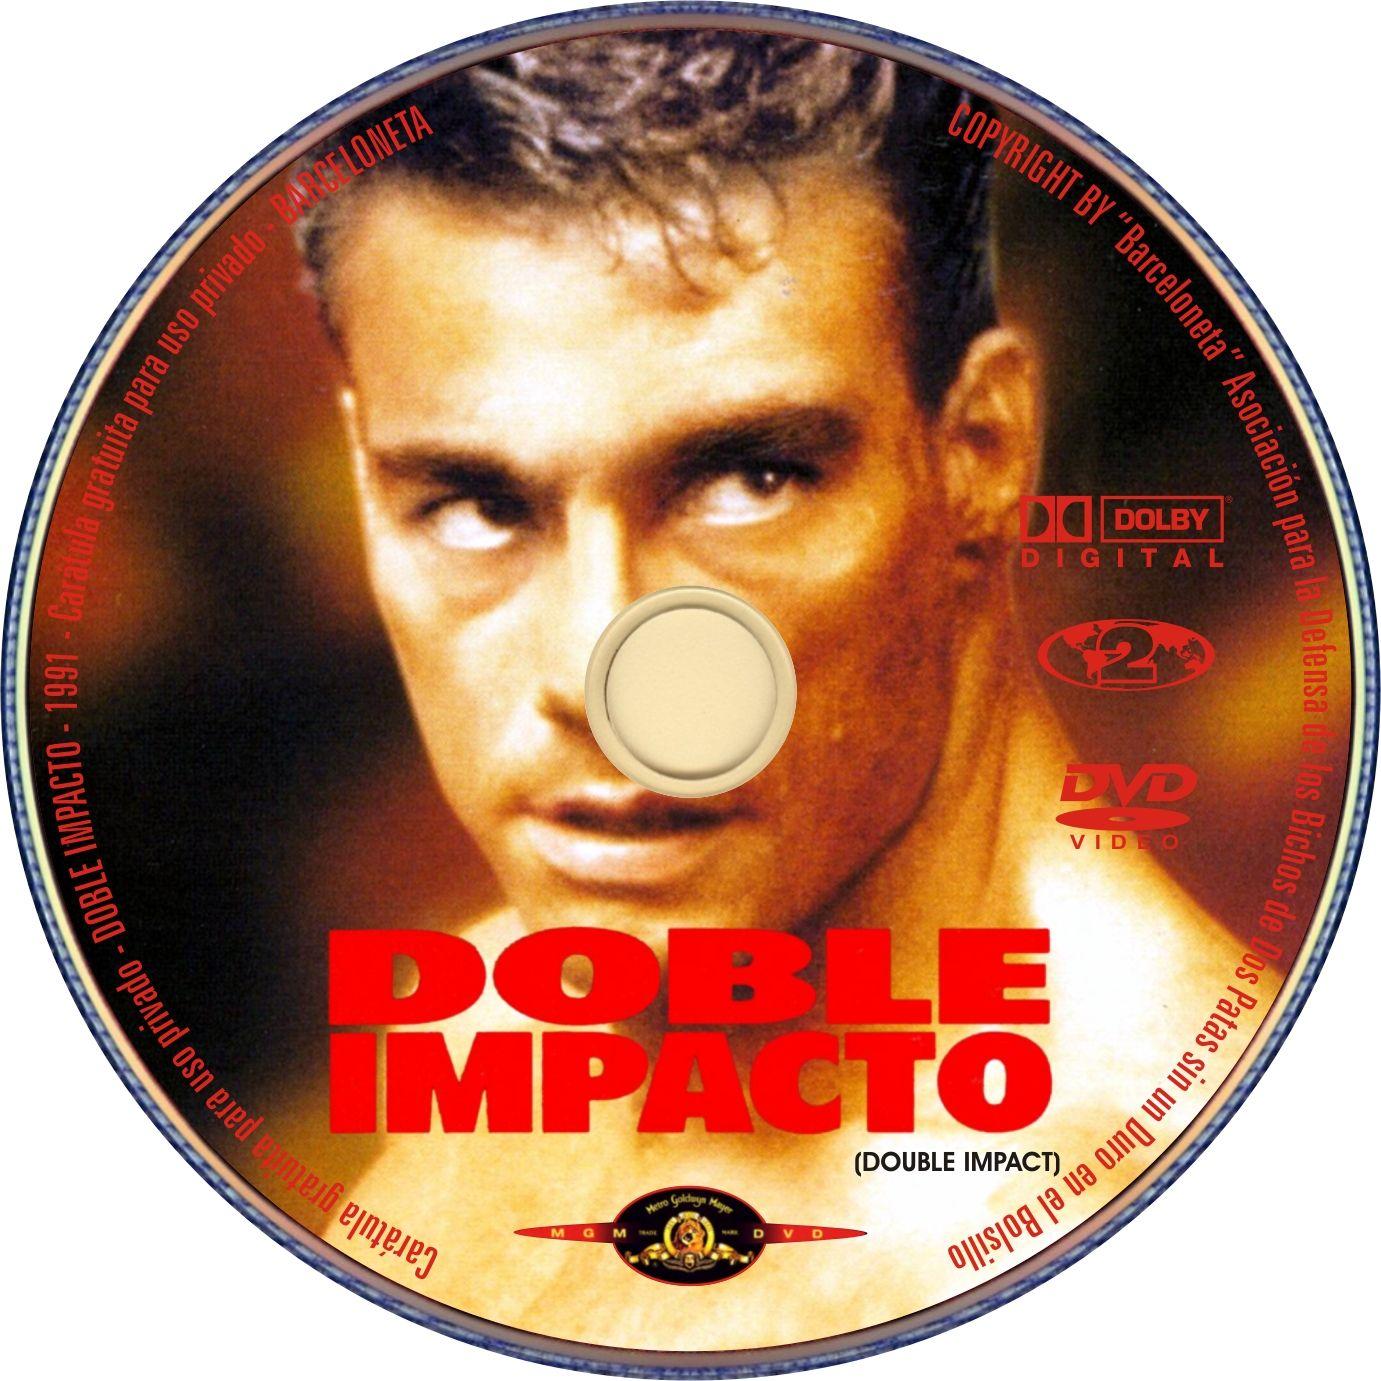 www doble impacto: